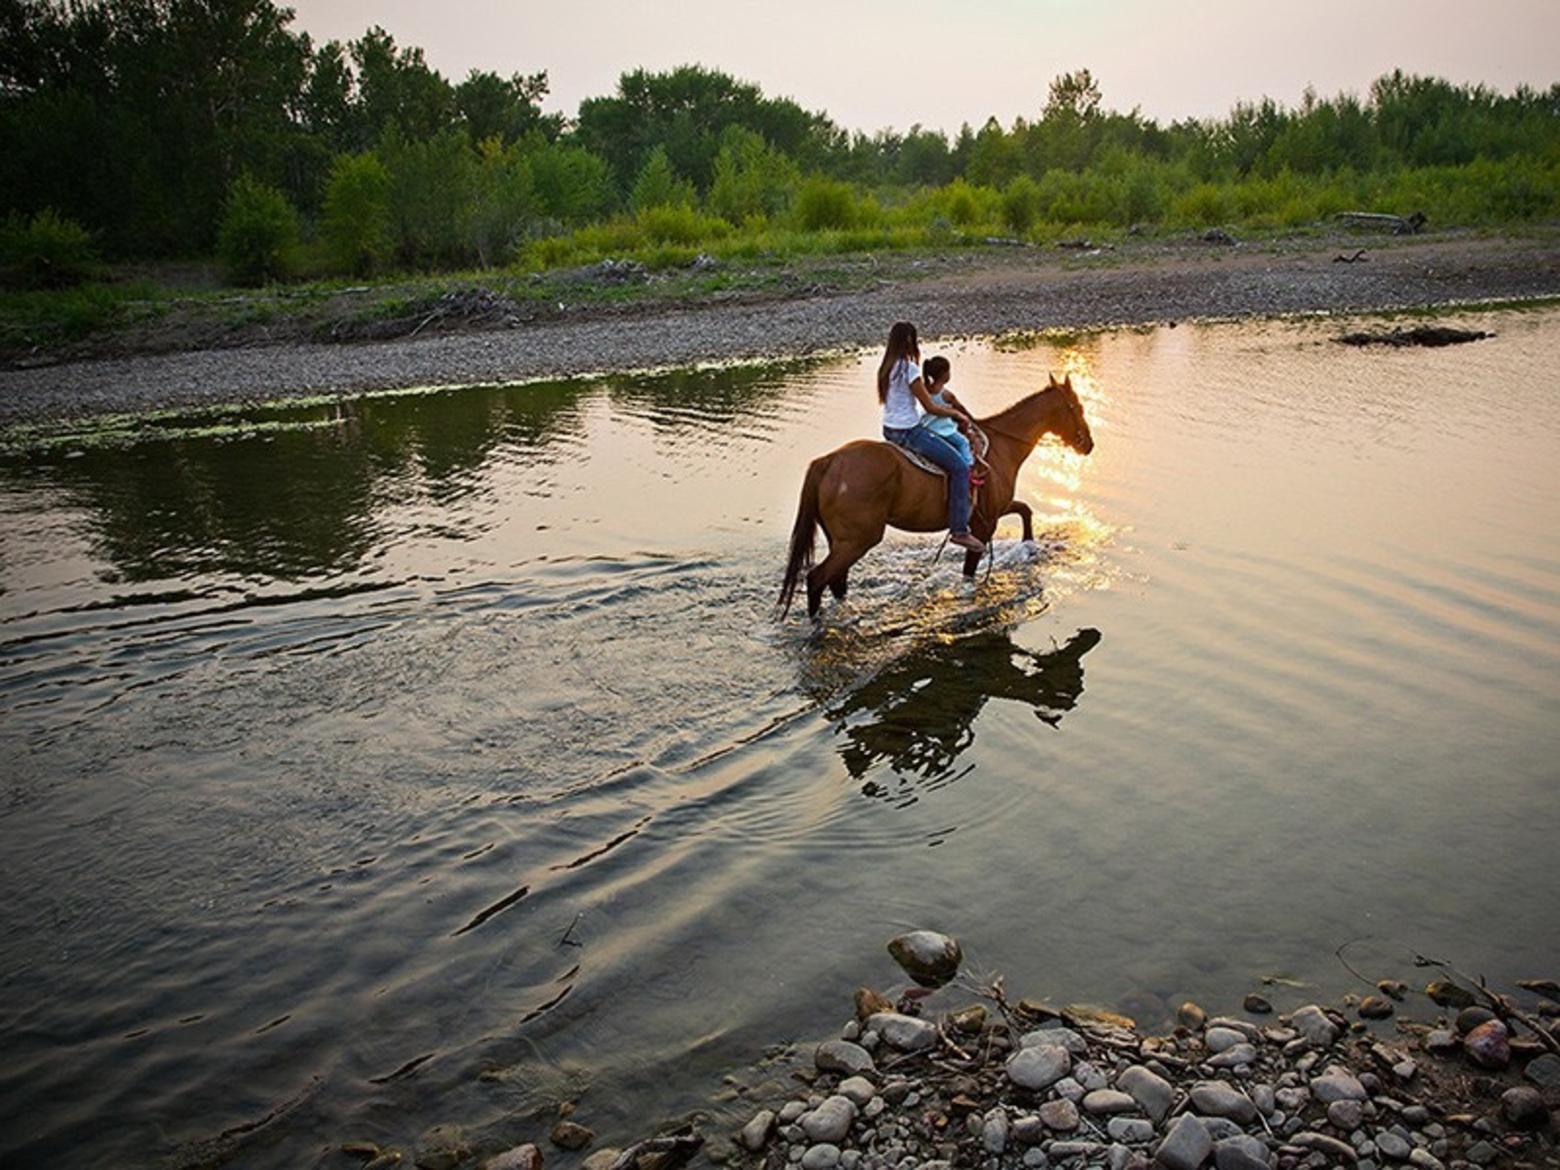 Kendall Edmo takes her daughter on a horseback ride through Blackfeet country in northern Montana. Photo courtesy Rebecca Drobis (rebeccadrobis.com)